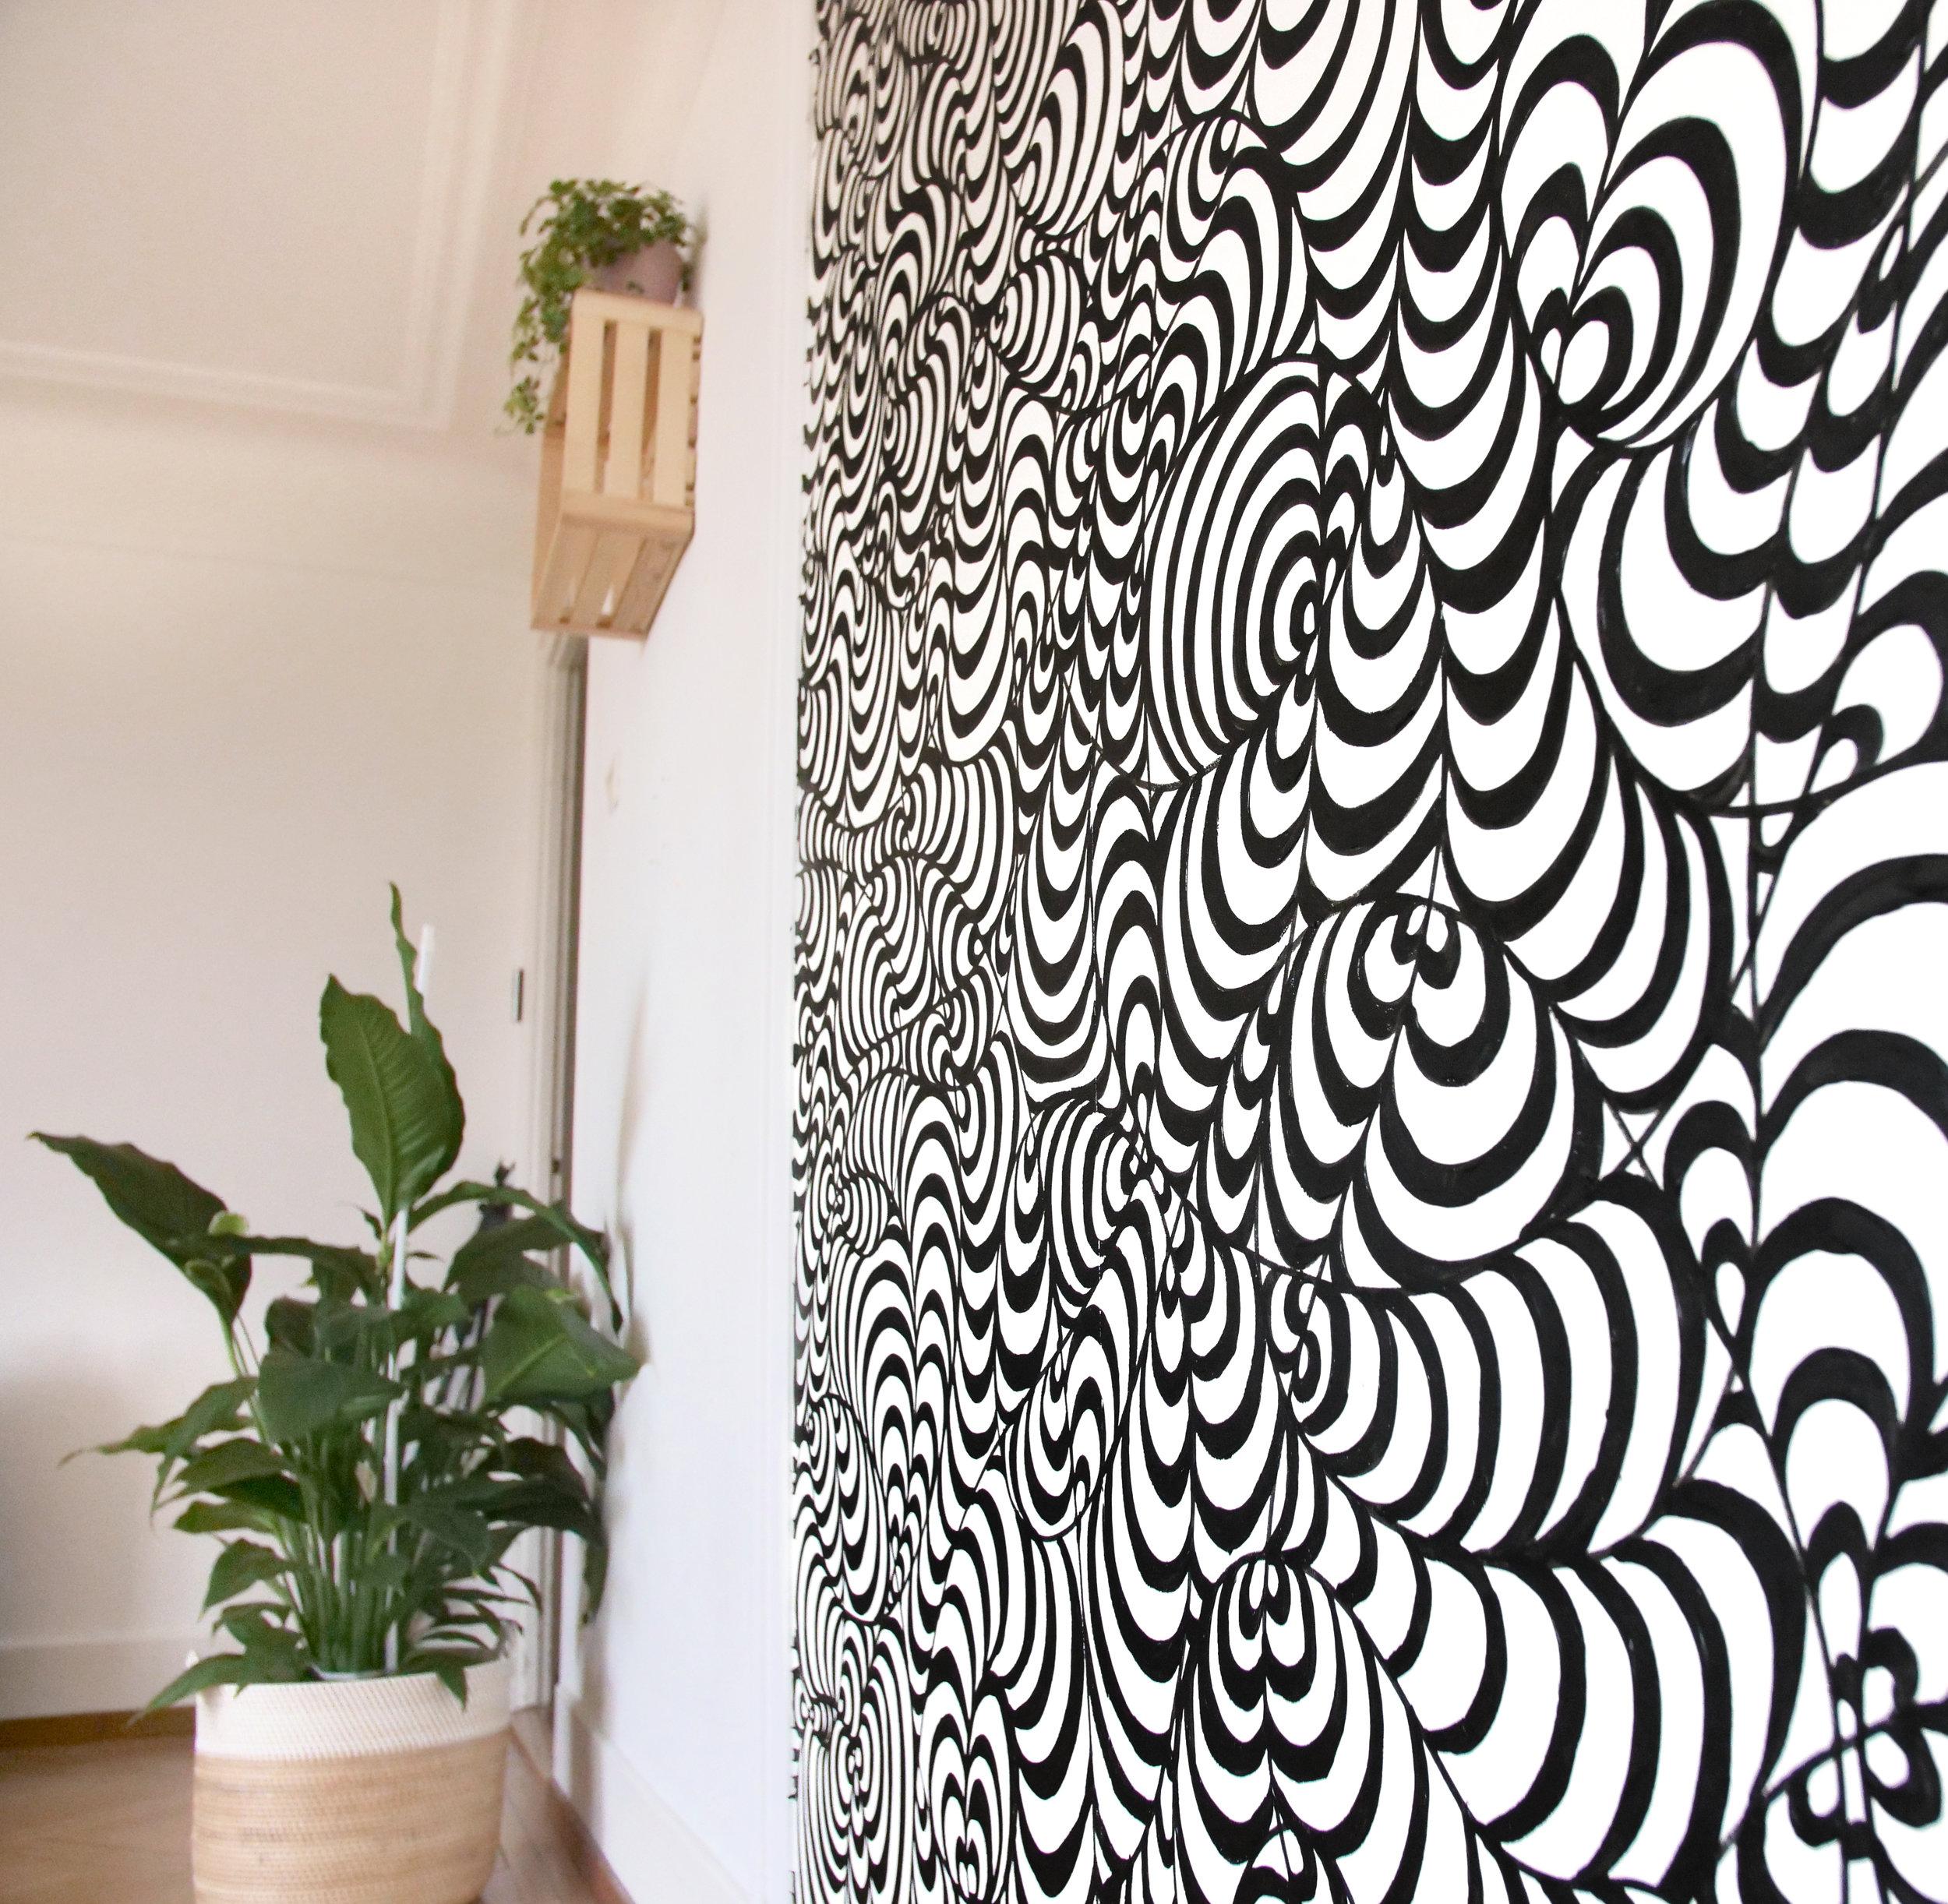 stillonoir_depanneur-mural_angle